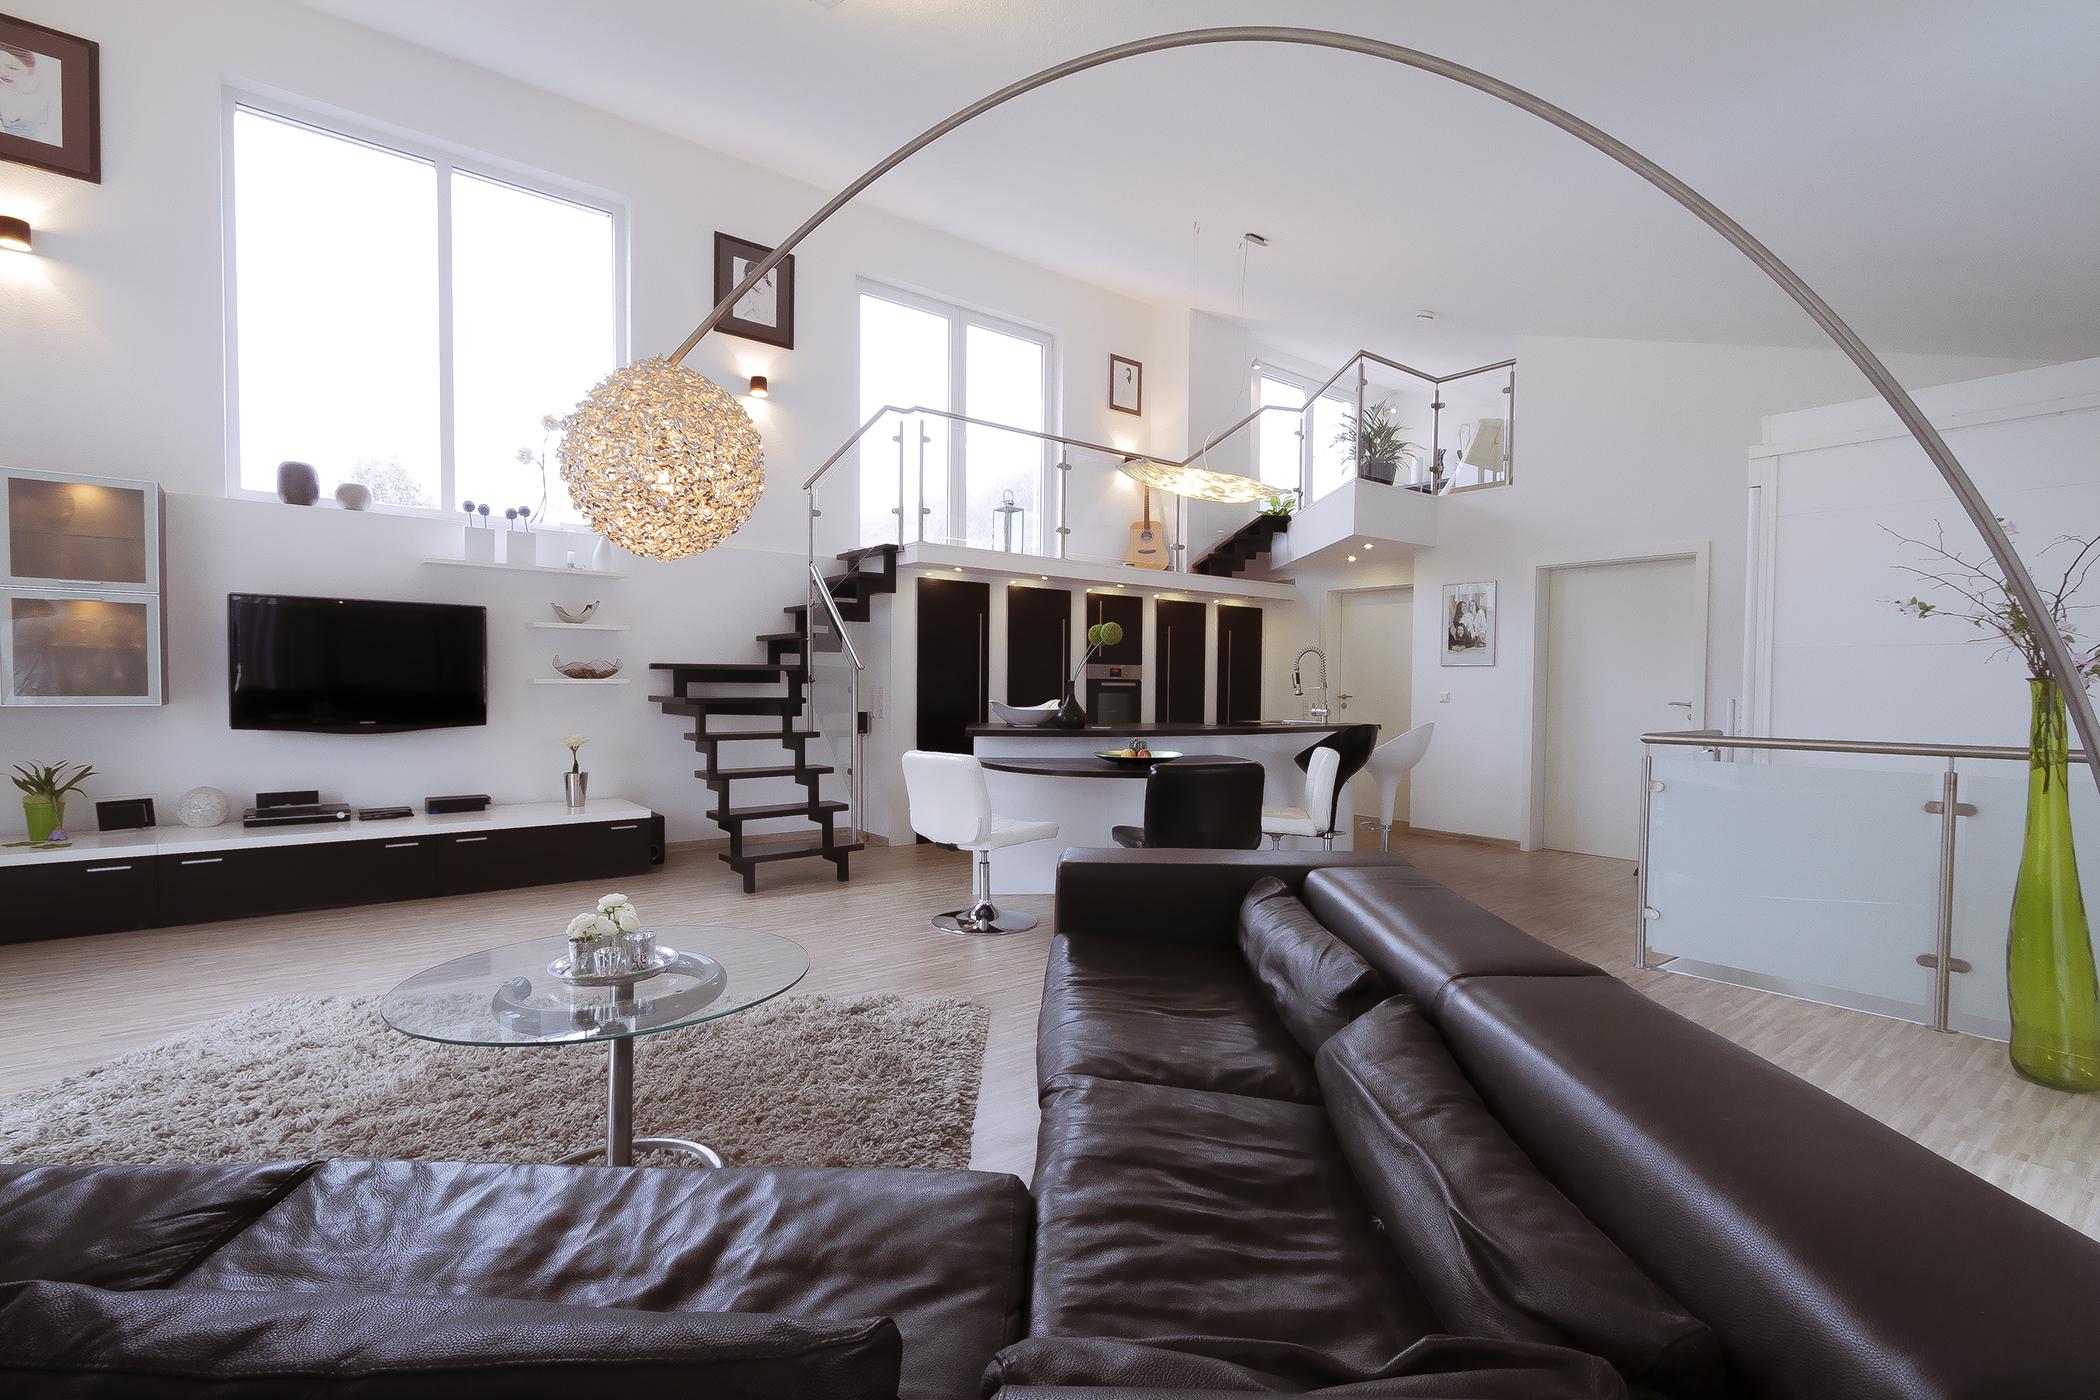 Innenarchitektur-Marius-Thessenvitz-Dachkomplett-3